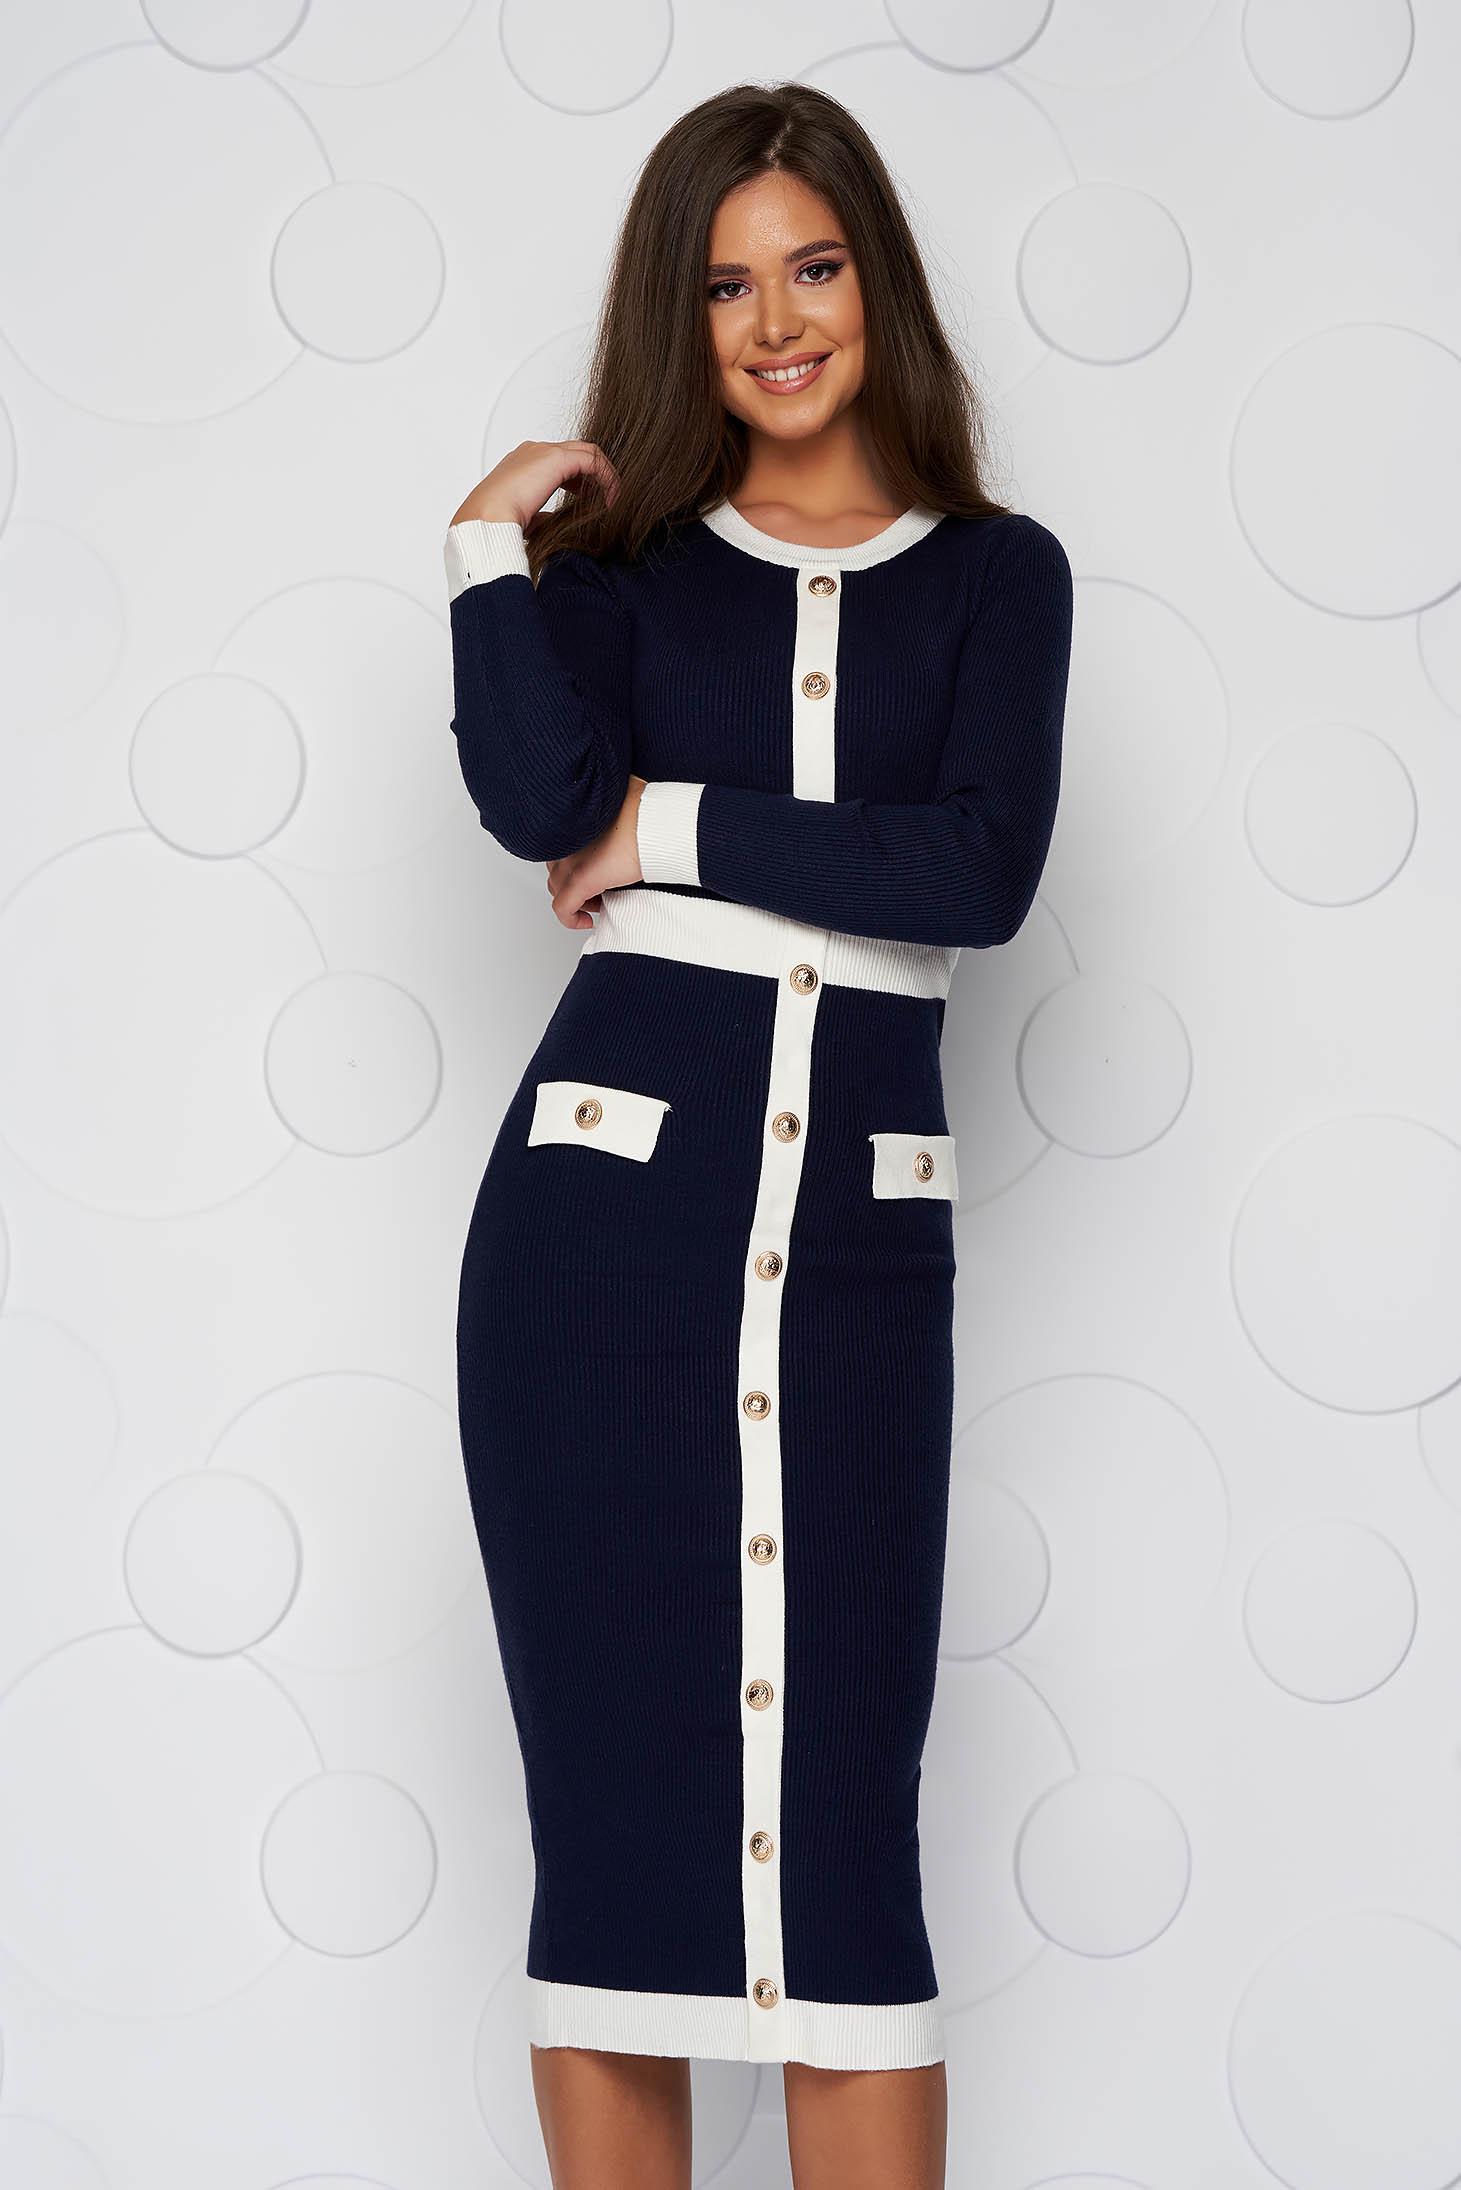 Rochie SunShine albastru-inchis midi tip creion din material tricotat accesorizata cu nasturi cu buzunare false